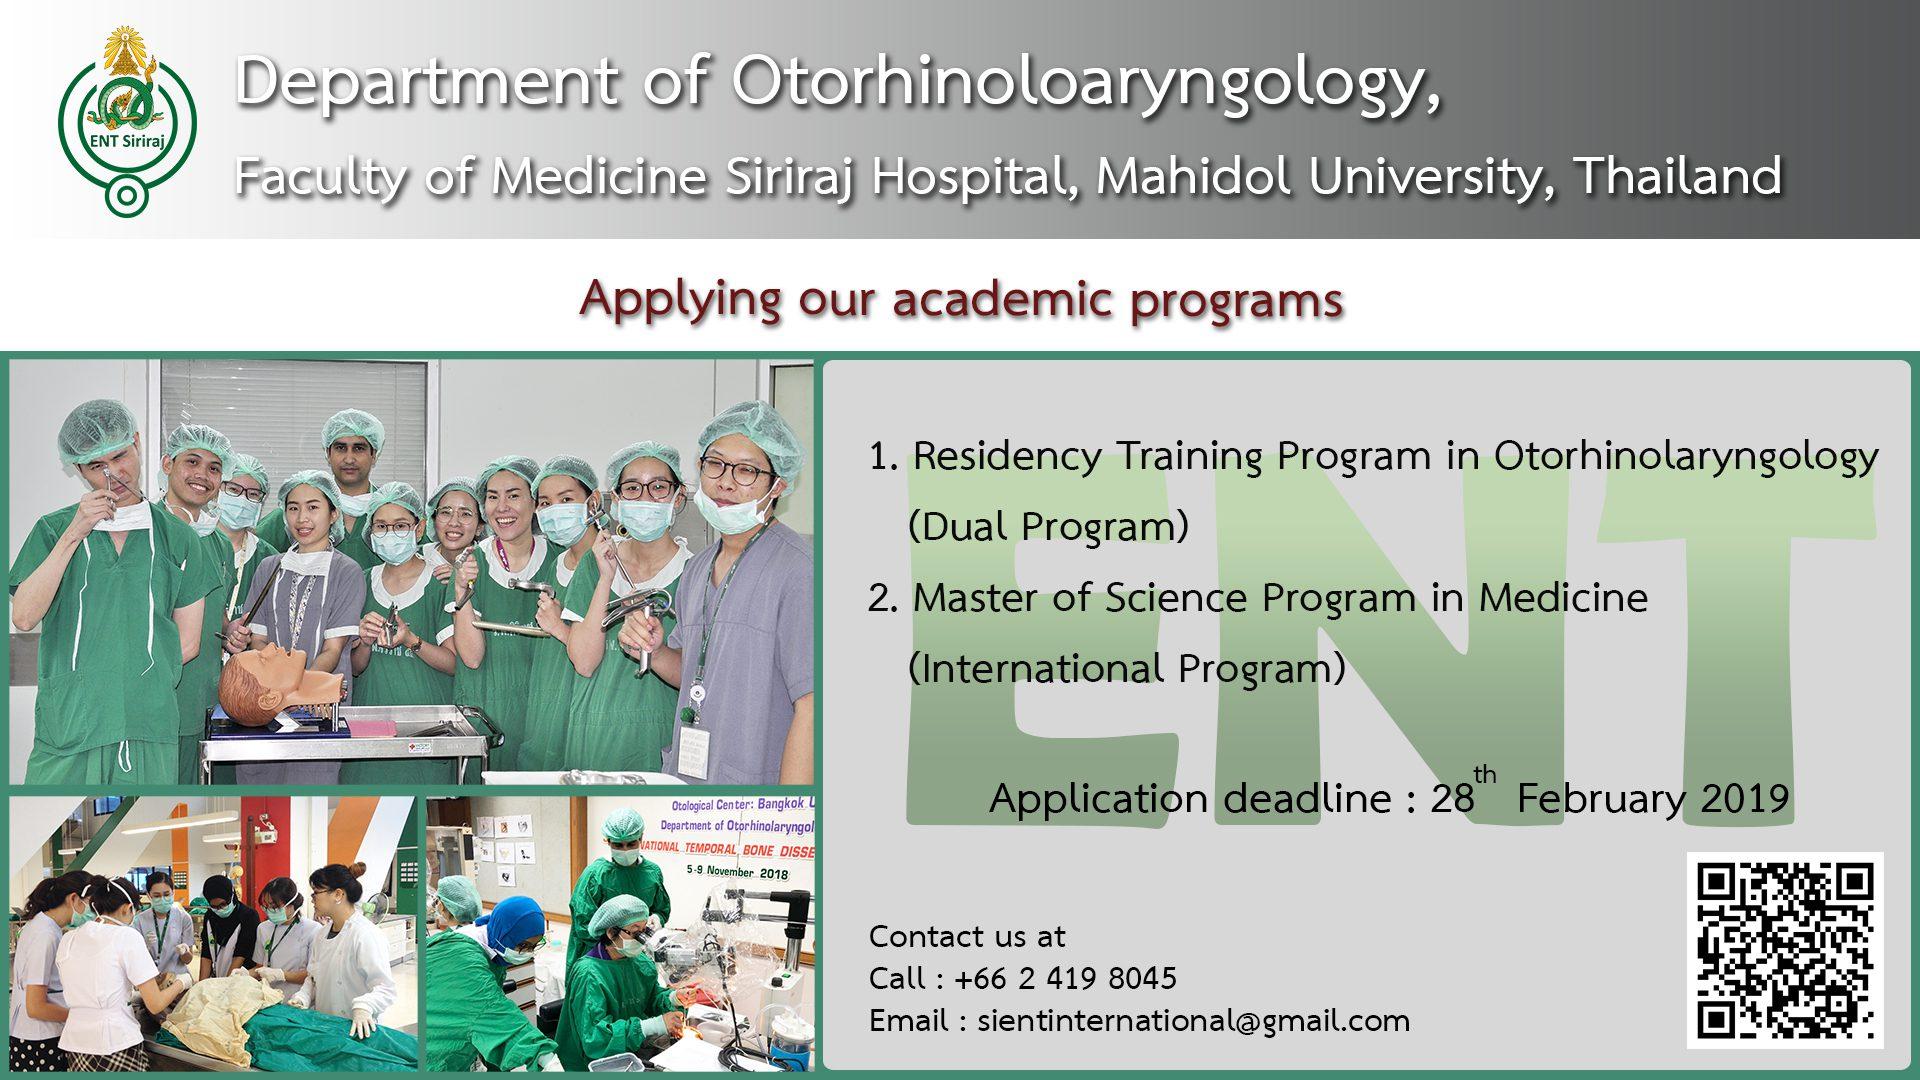 Department of Otorhinolaryngology's Announcement for the 2019 Academic Programs